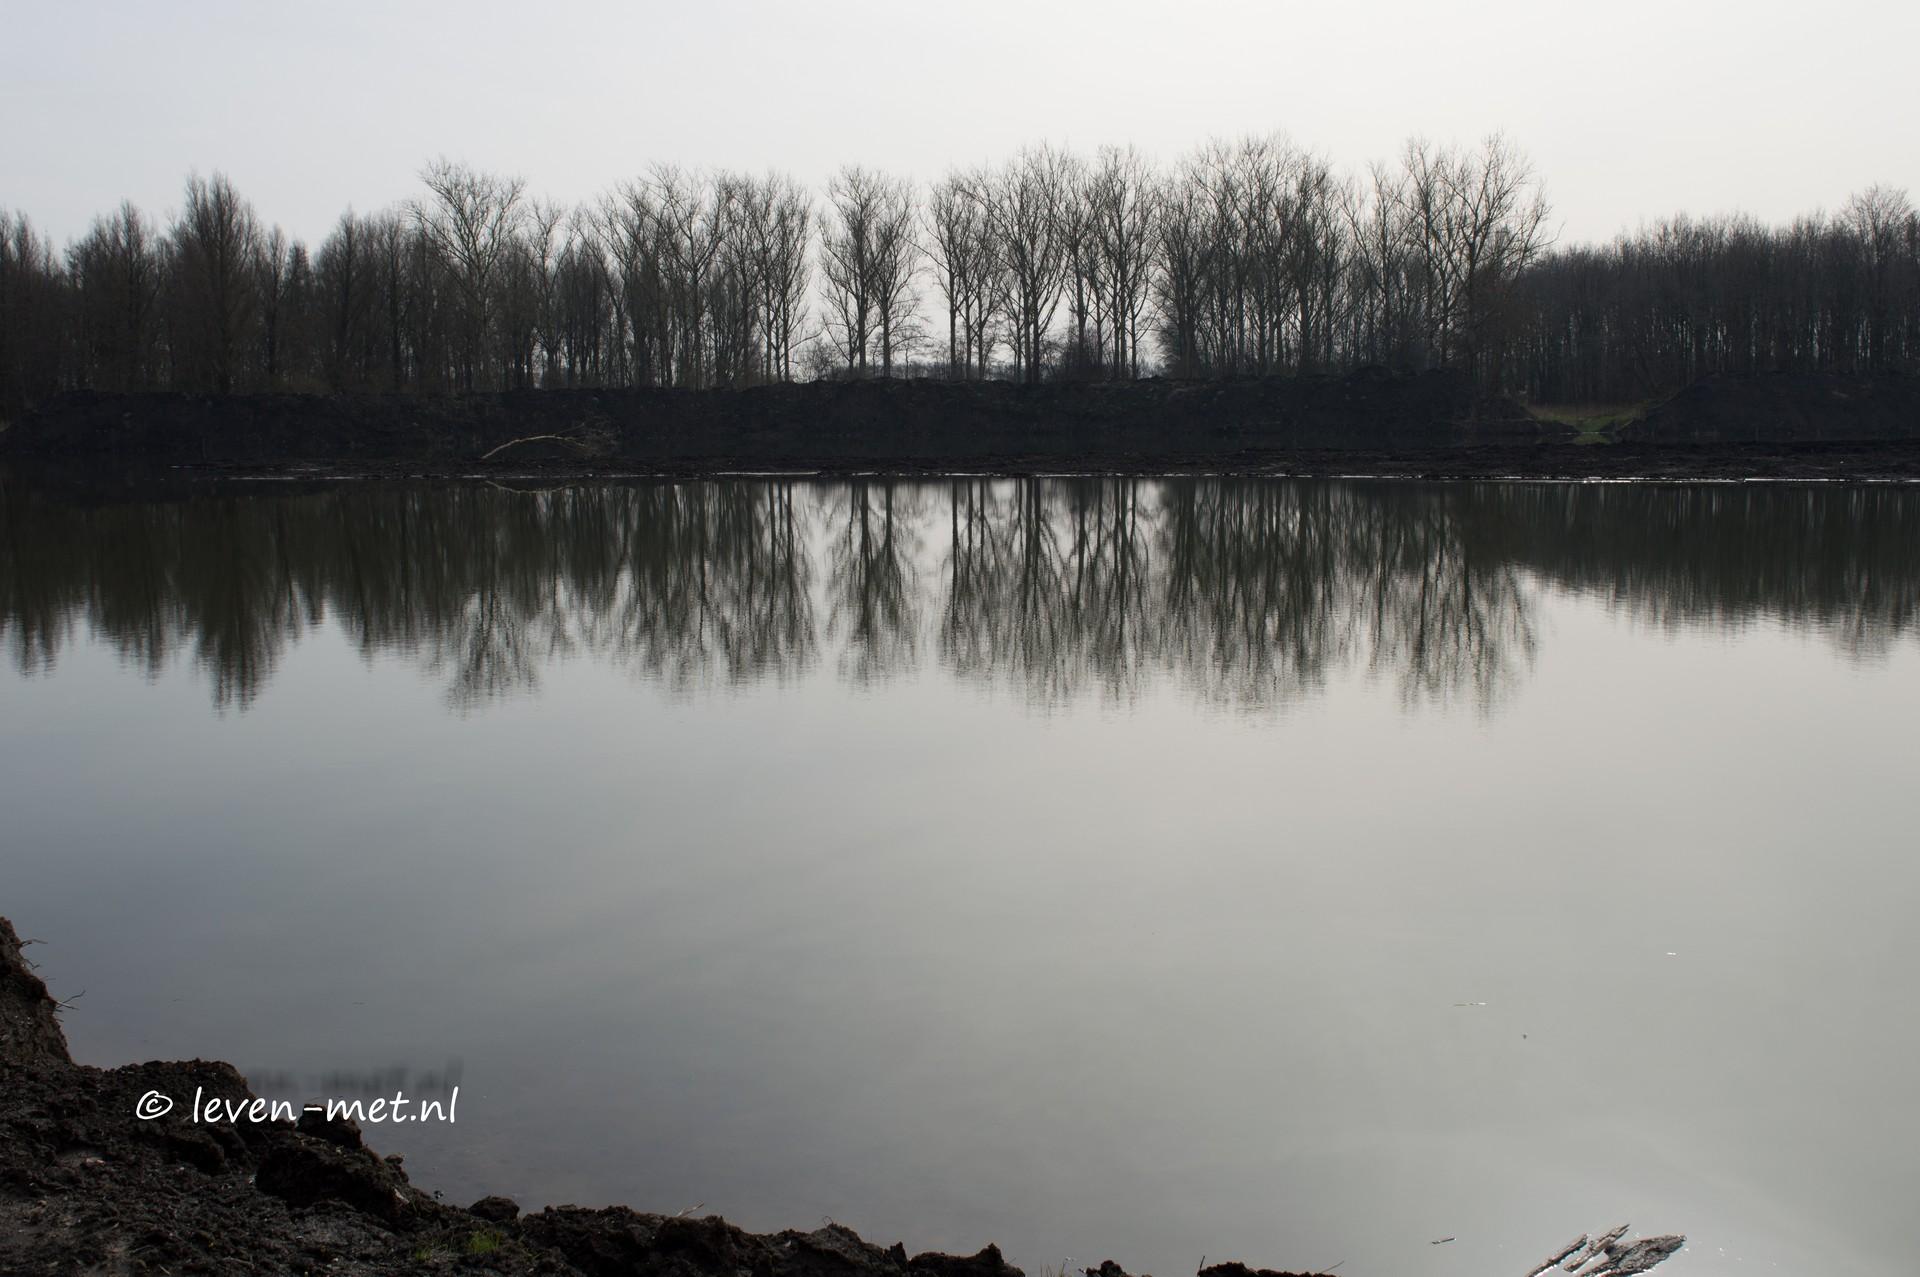 Hollandsehout de Krakeendhut en Oostvaardersplassen